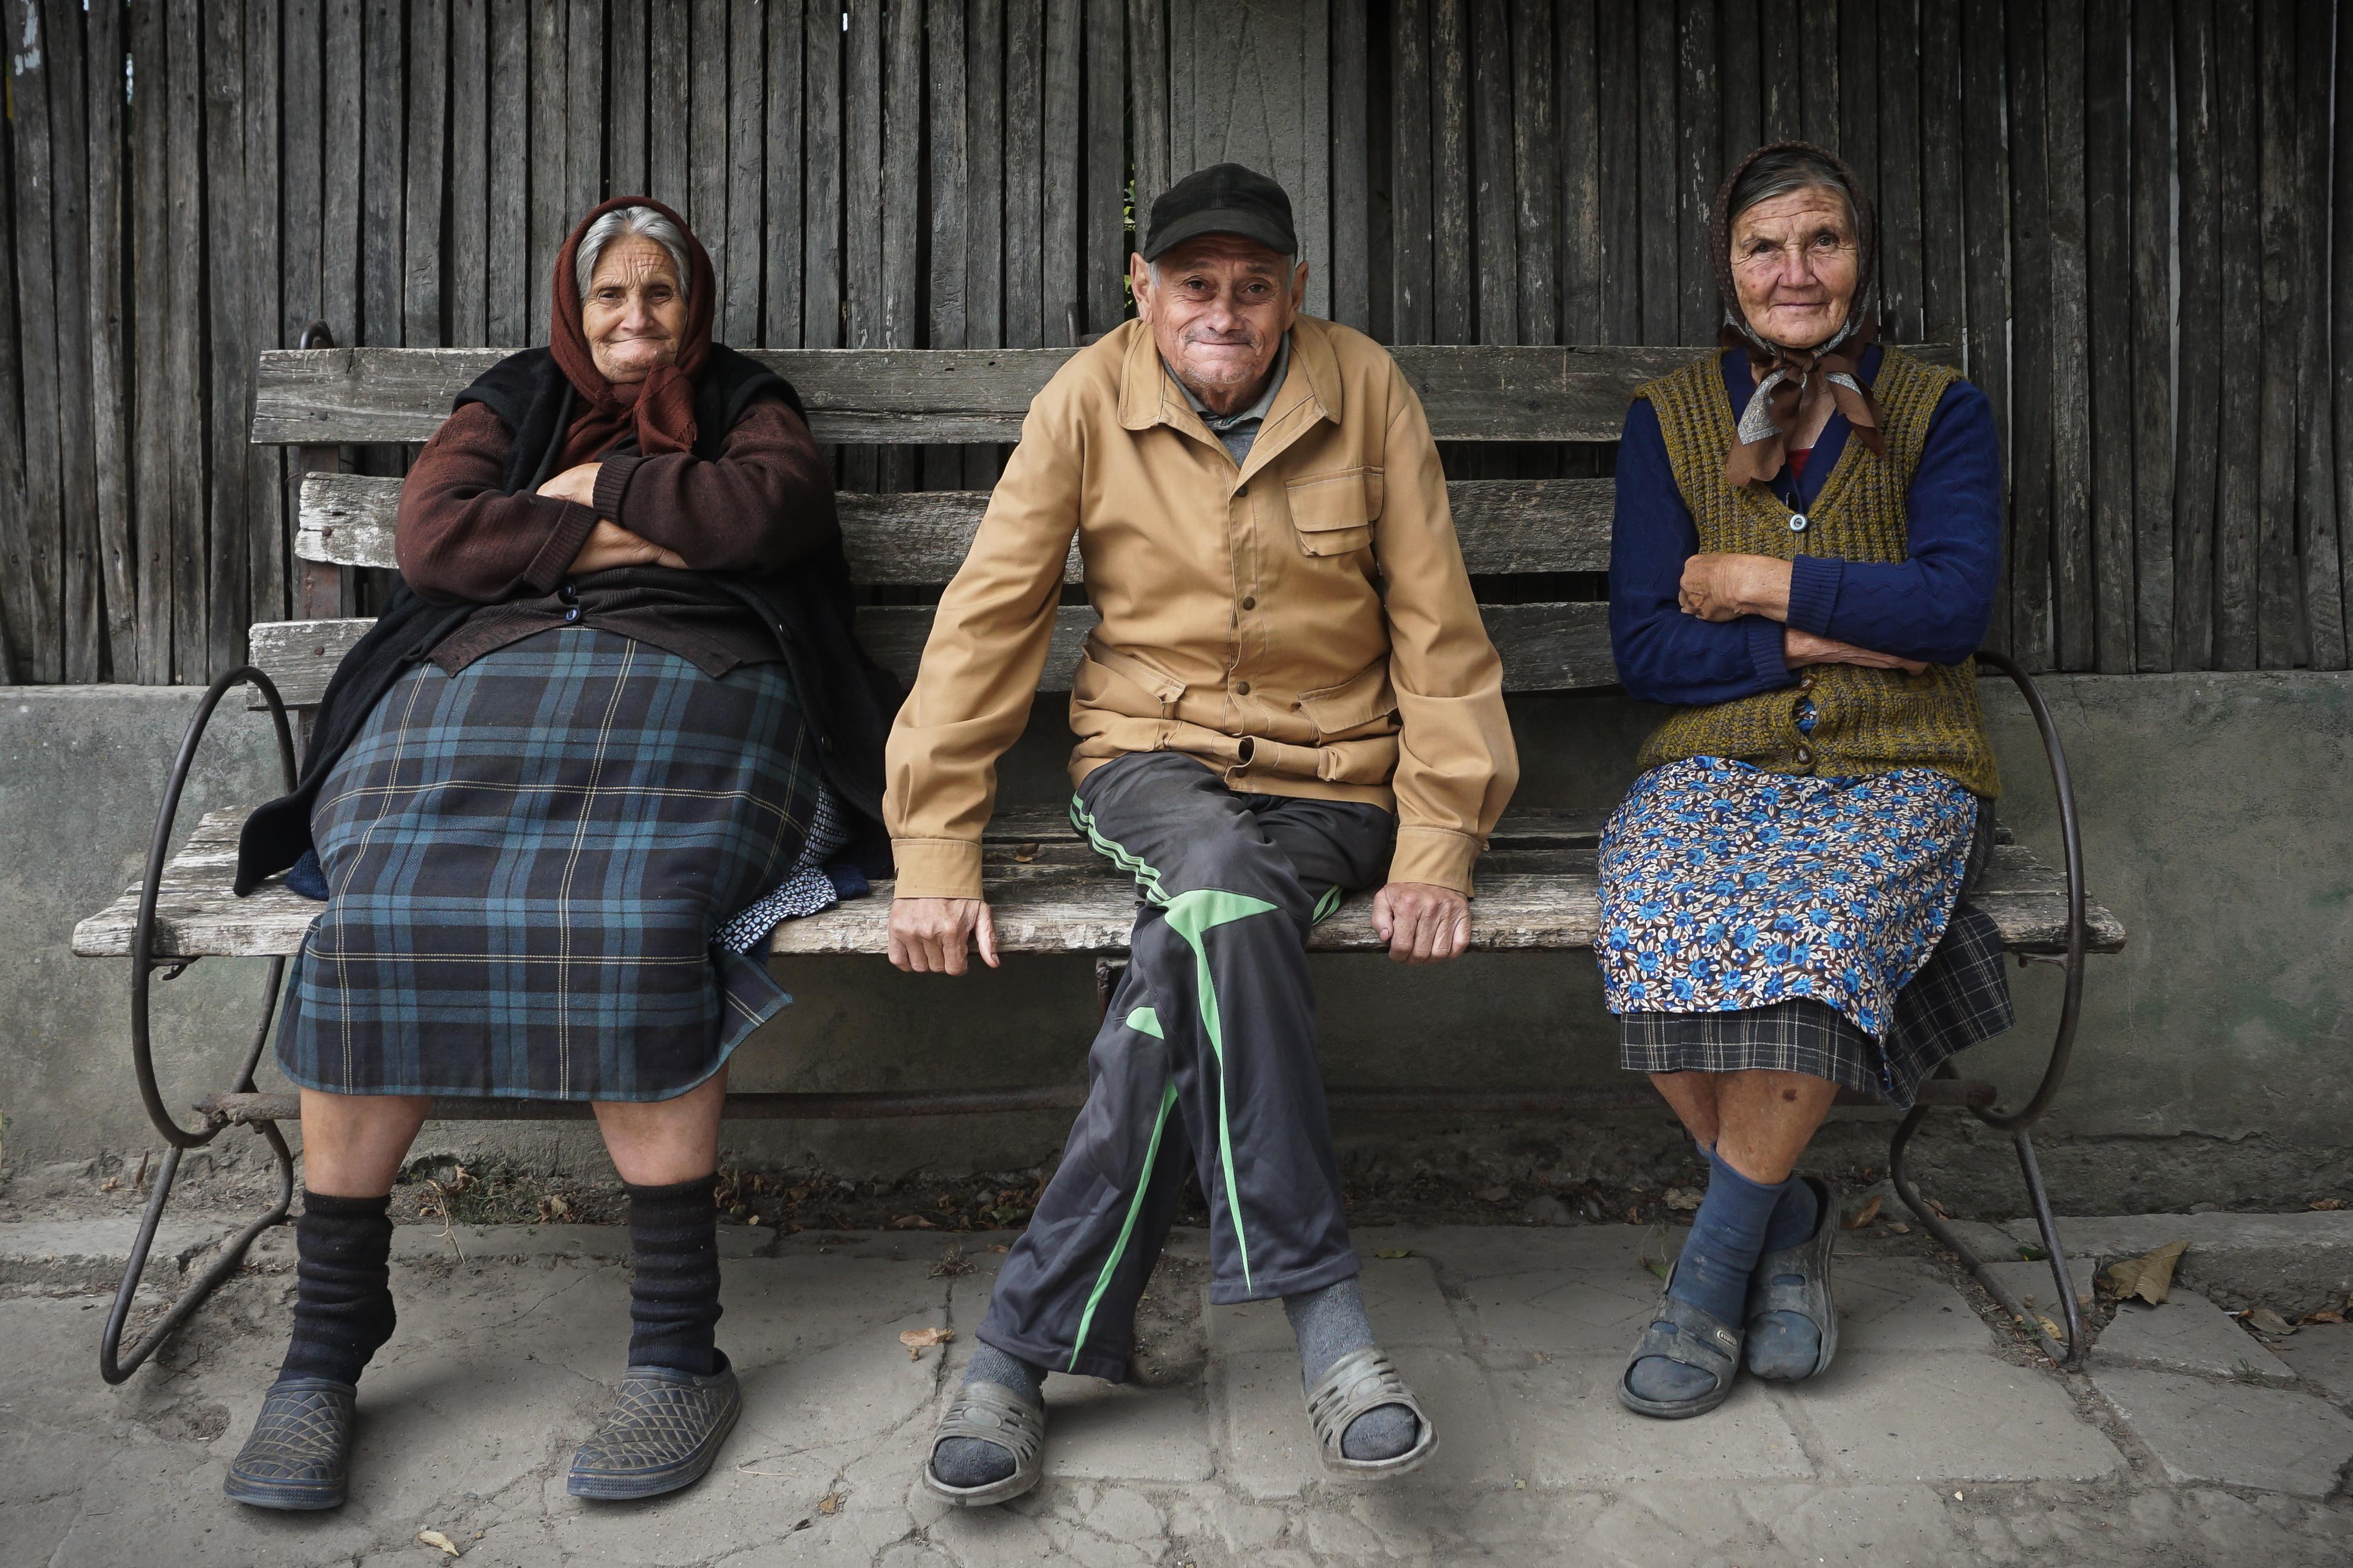 Romanian villagers